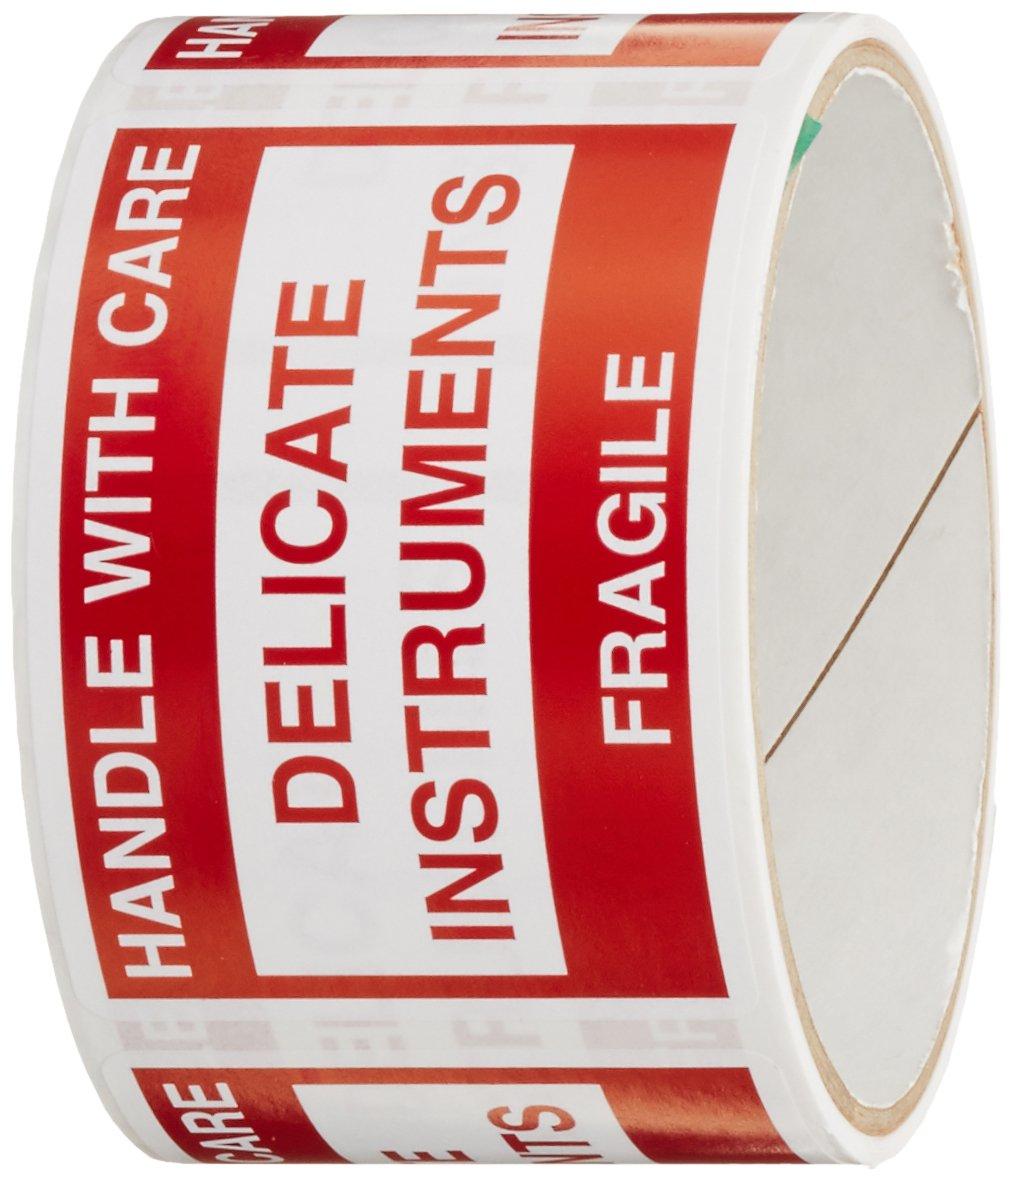 TapeCase SHIPLBL-011-50'Delicate Instruments, Fragile' Label - 50 per pack (1 Pack) Fragile Label - 50 per pack (1 Pack)